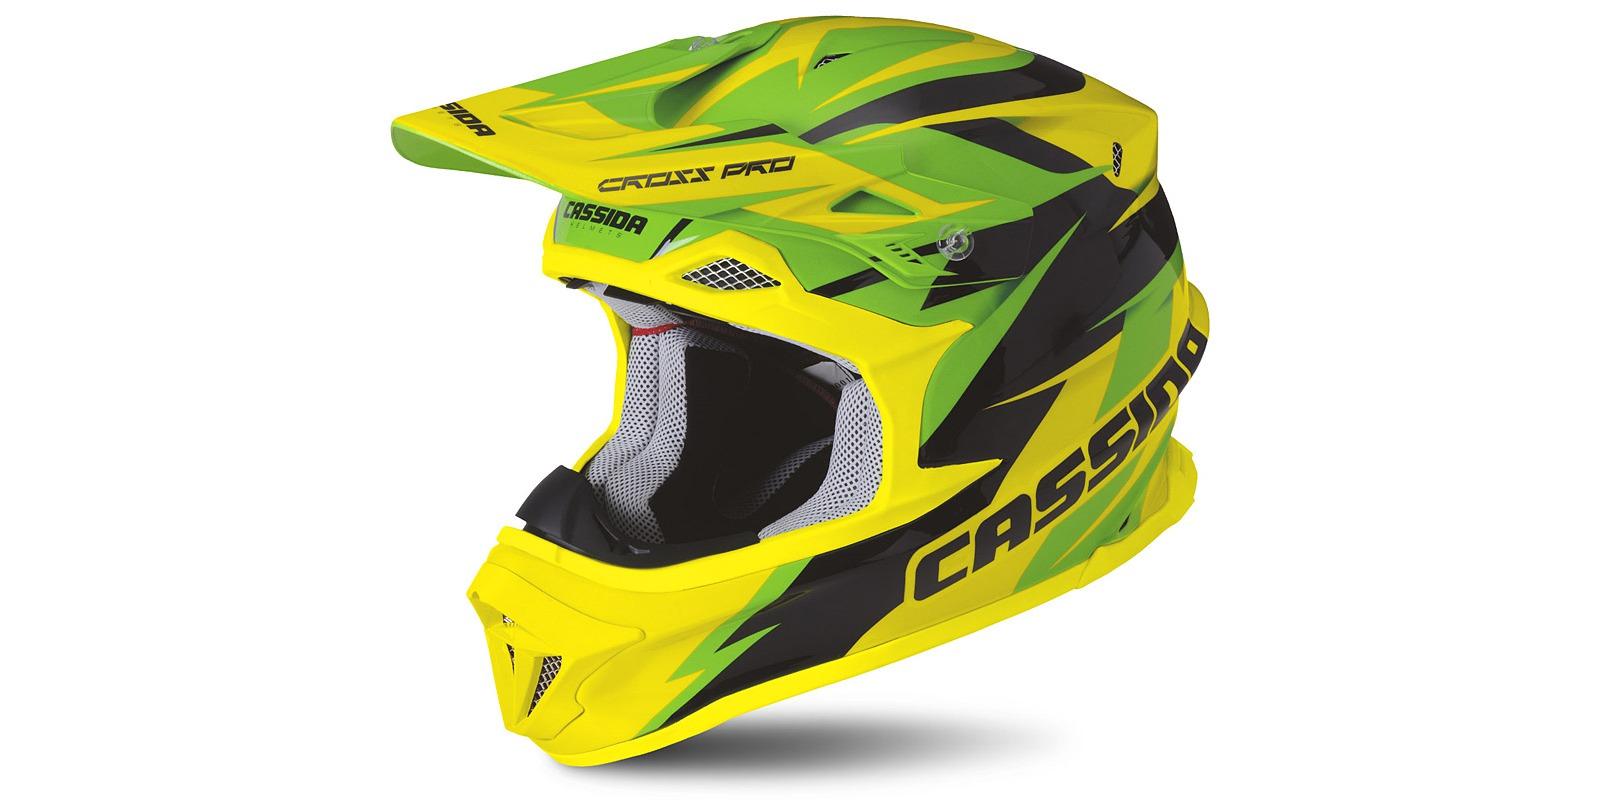 mx helma cassida cross pro žlutá fluo černá bílá moto adamek 1